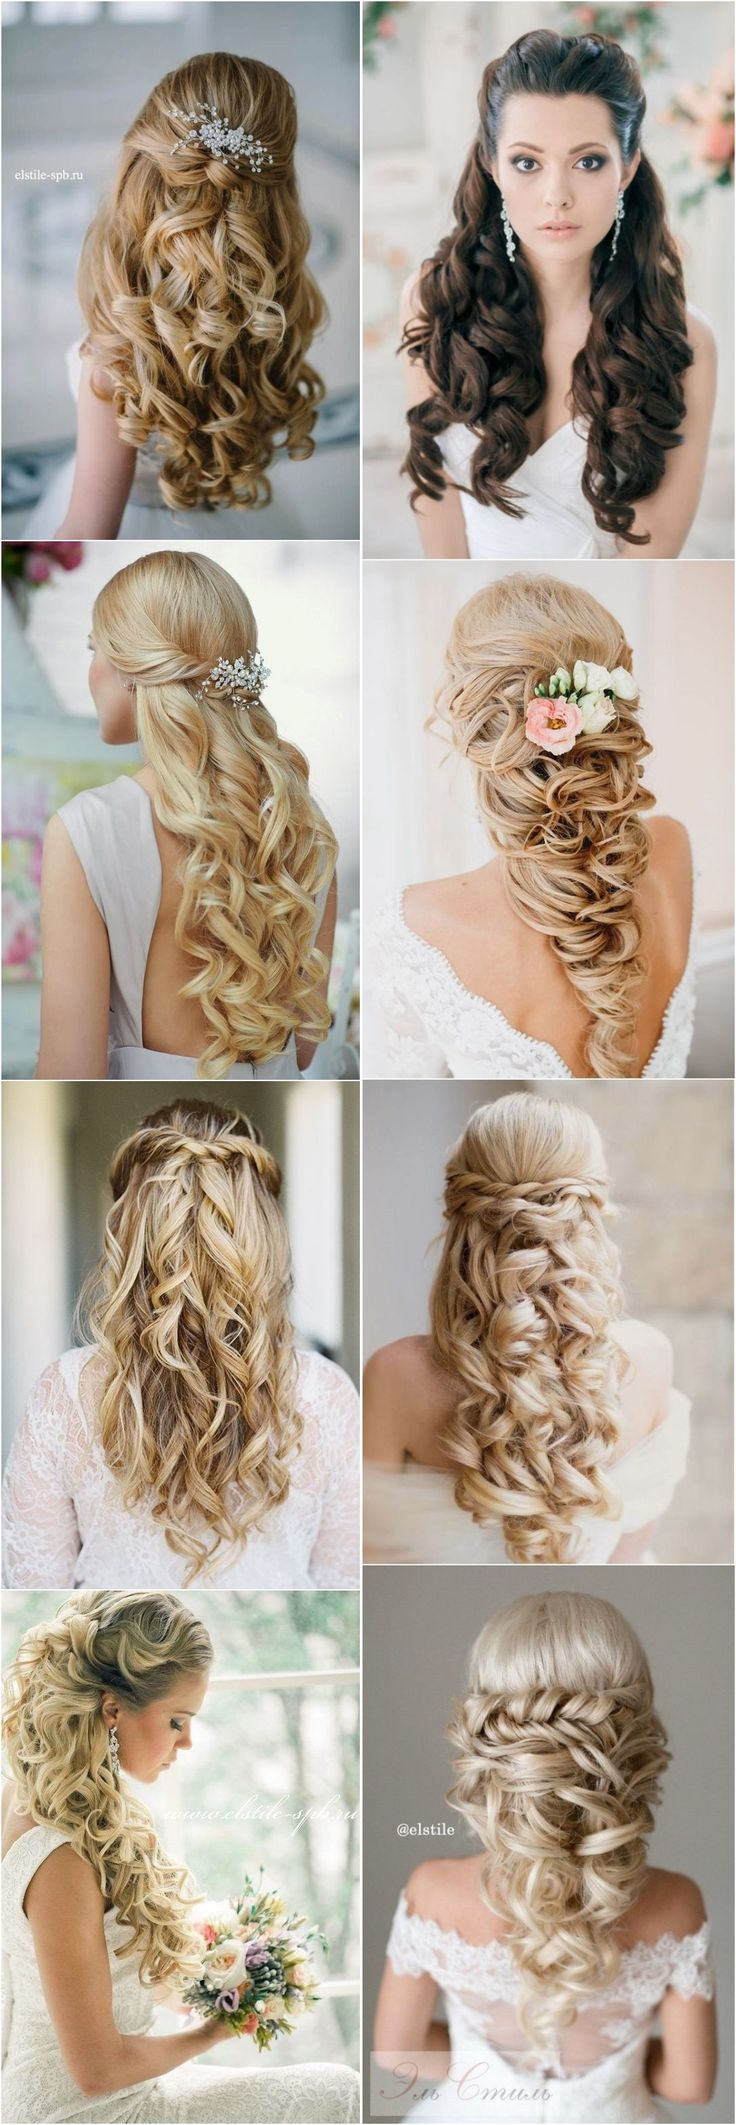 Peinado-stunning-half-up-half-down-wedding-hairstyles-with-tutorial/40 Stunning Half Up Half Down Wedding Hairstyles with Tutorial / http://www.deerpearlflowers.com/15-stunning-half-up-half-down-wedding-hairstyles-with-tutorial/